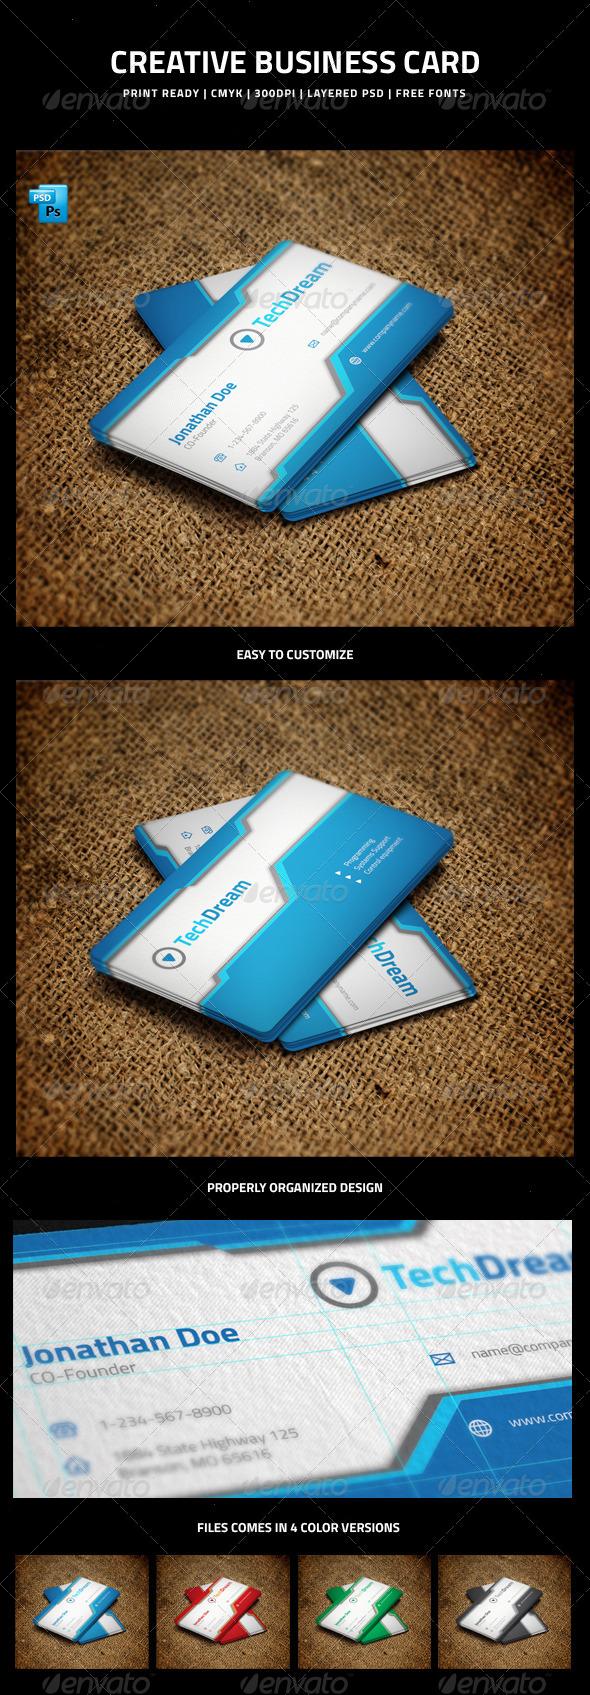 GraphicRiver Creative Business Card 5992011